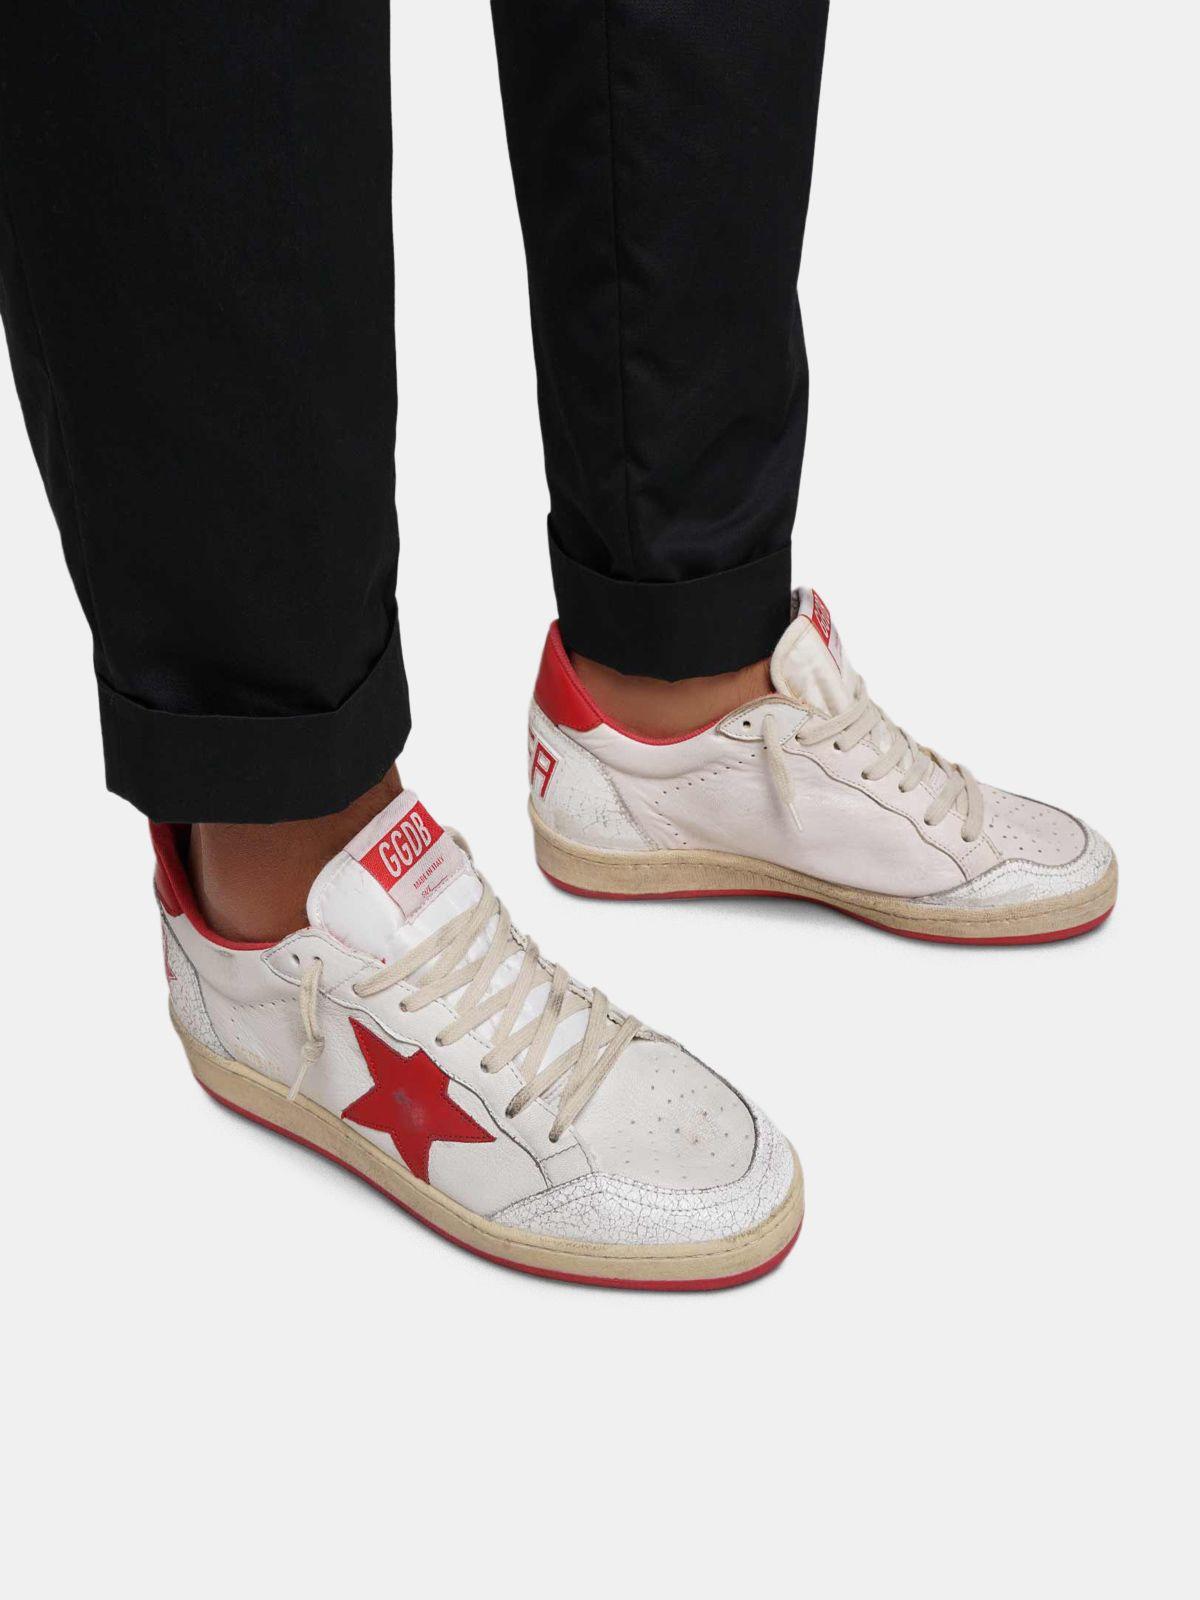 Golden Goose - Sneakers Ball Star bianche in pelle con stella e talloncino rossi in